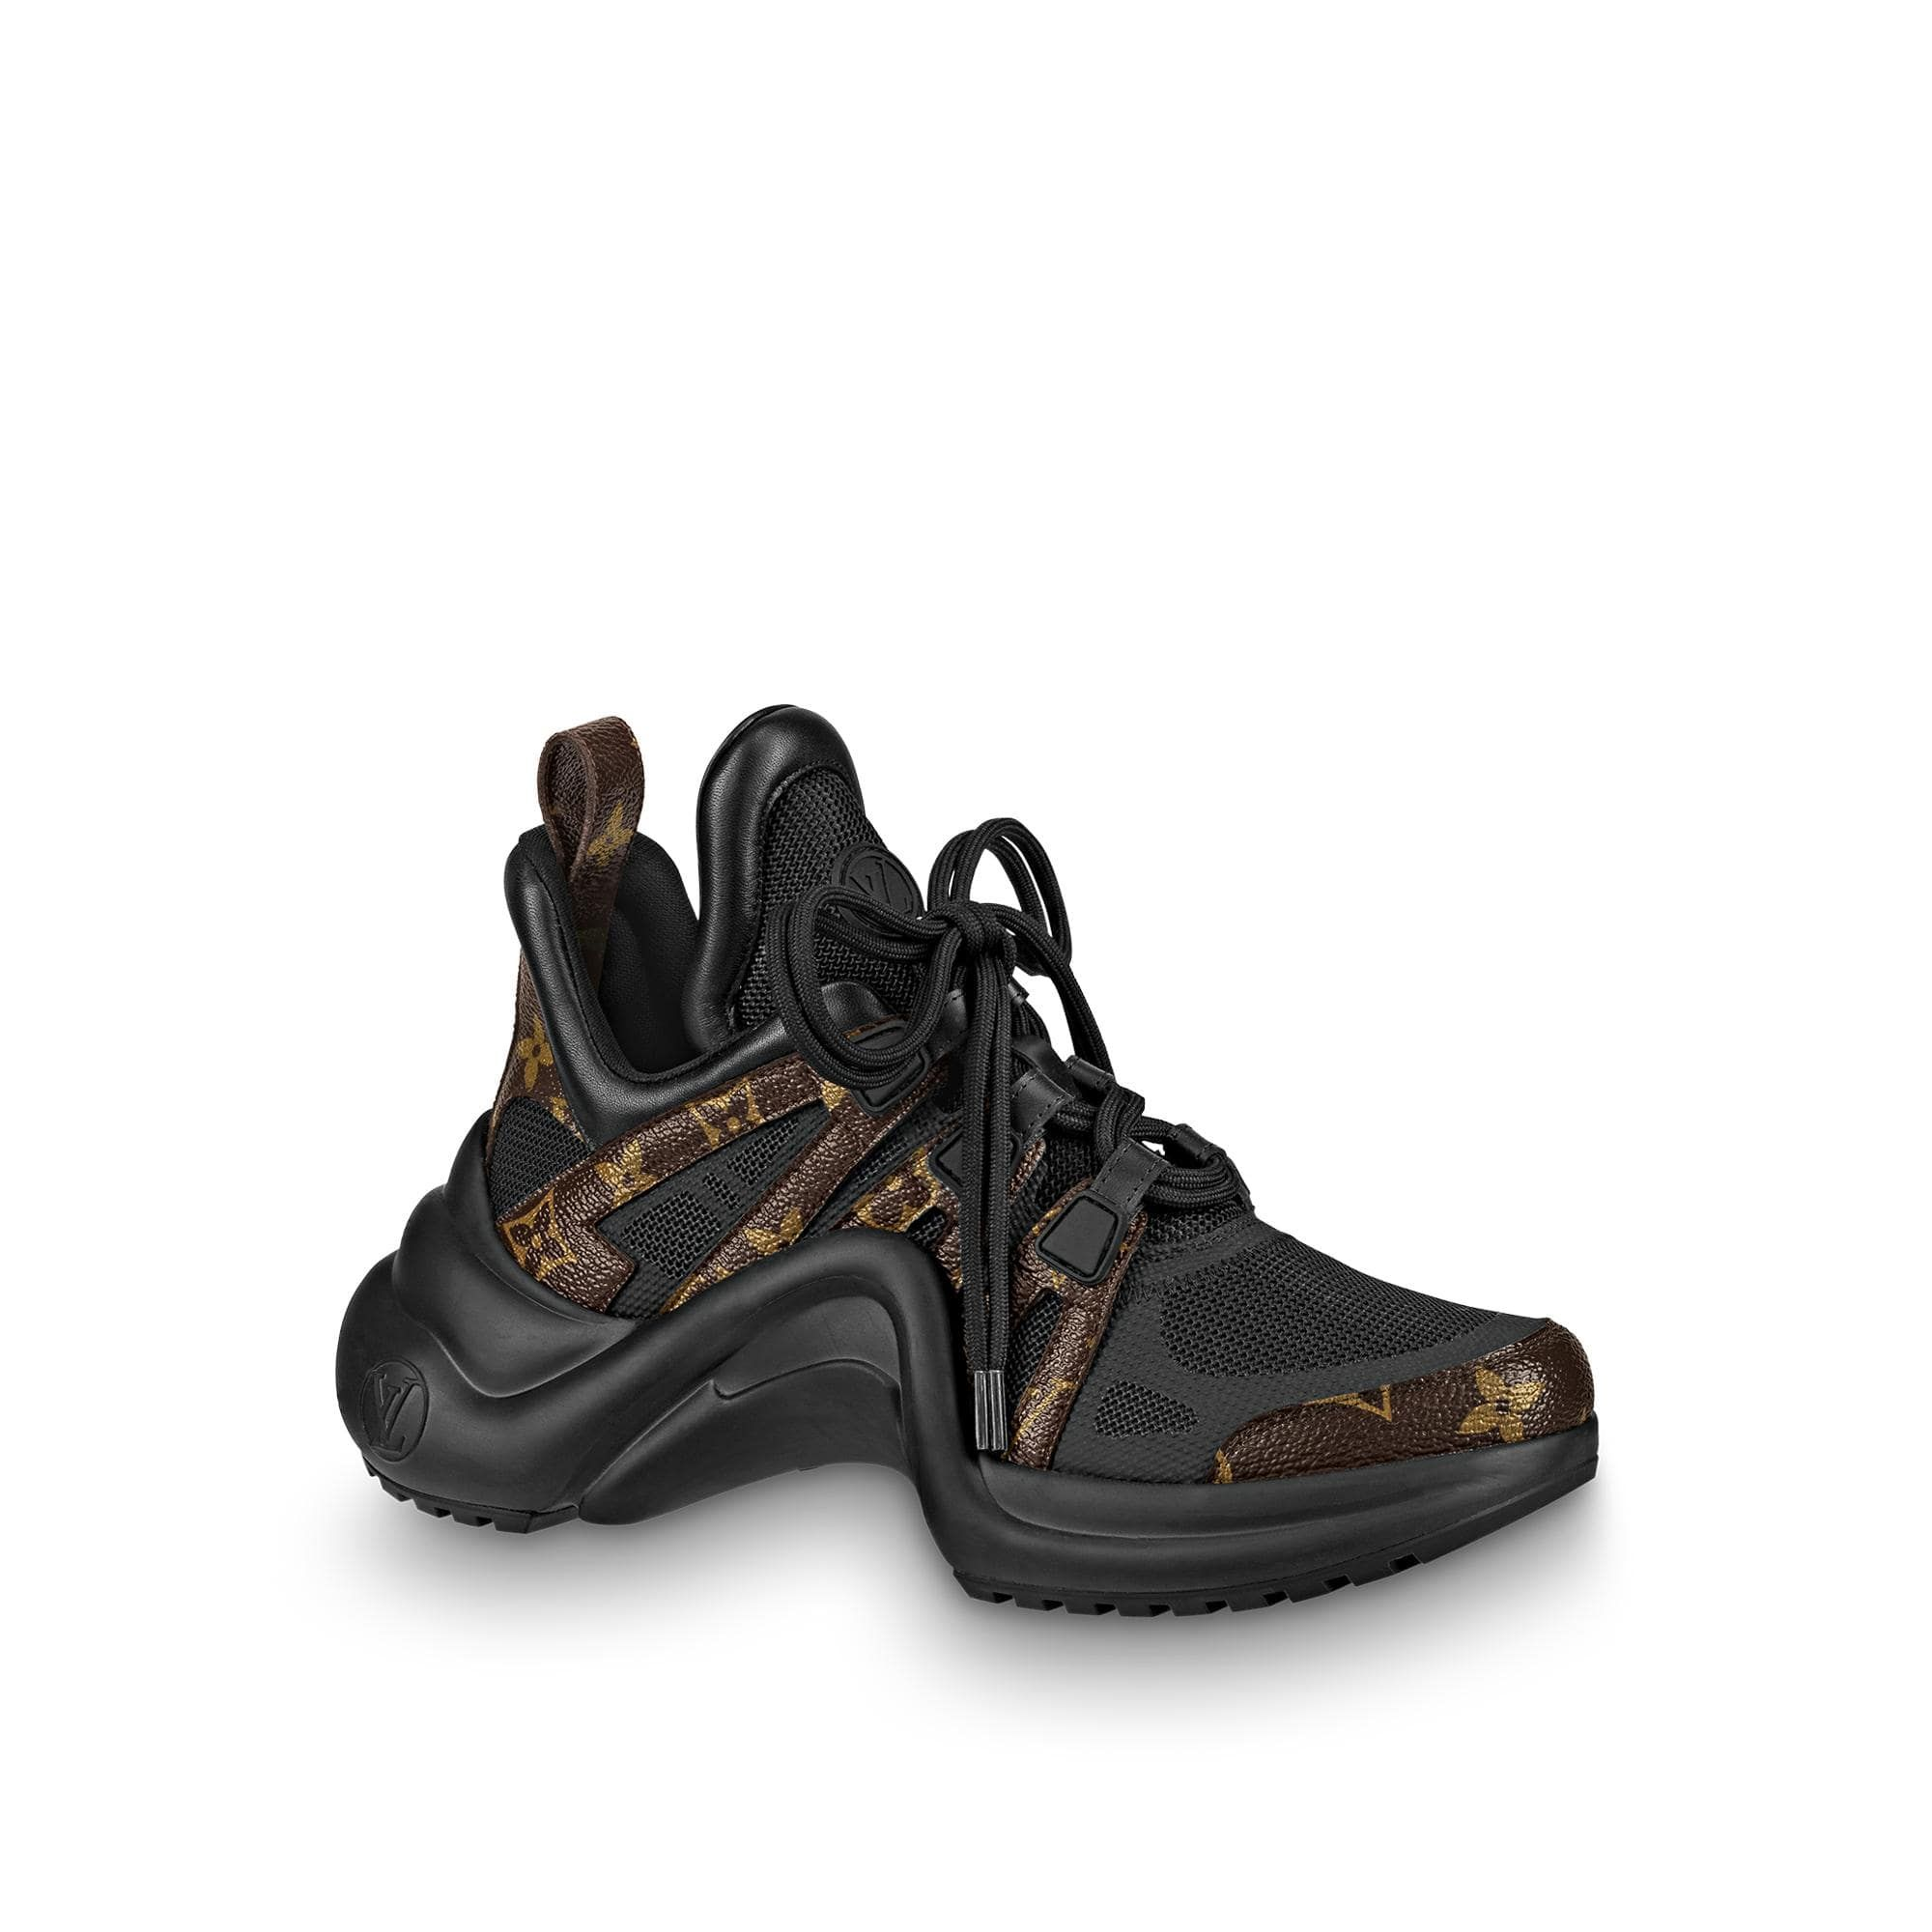 LV Archlight Trainer - Shoes | LOUIS